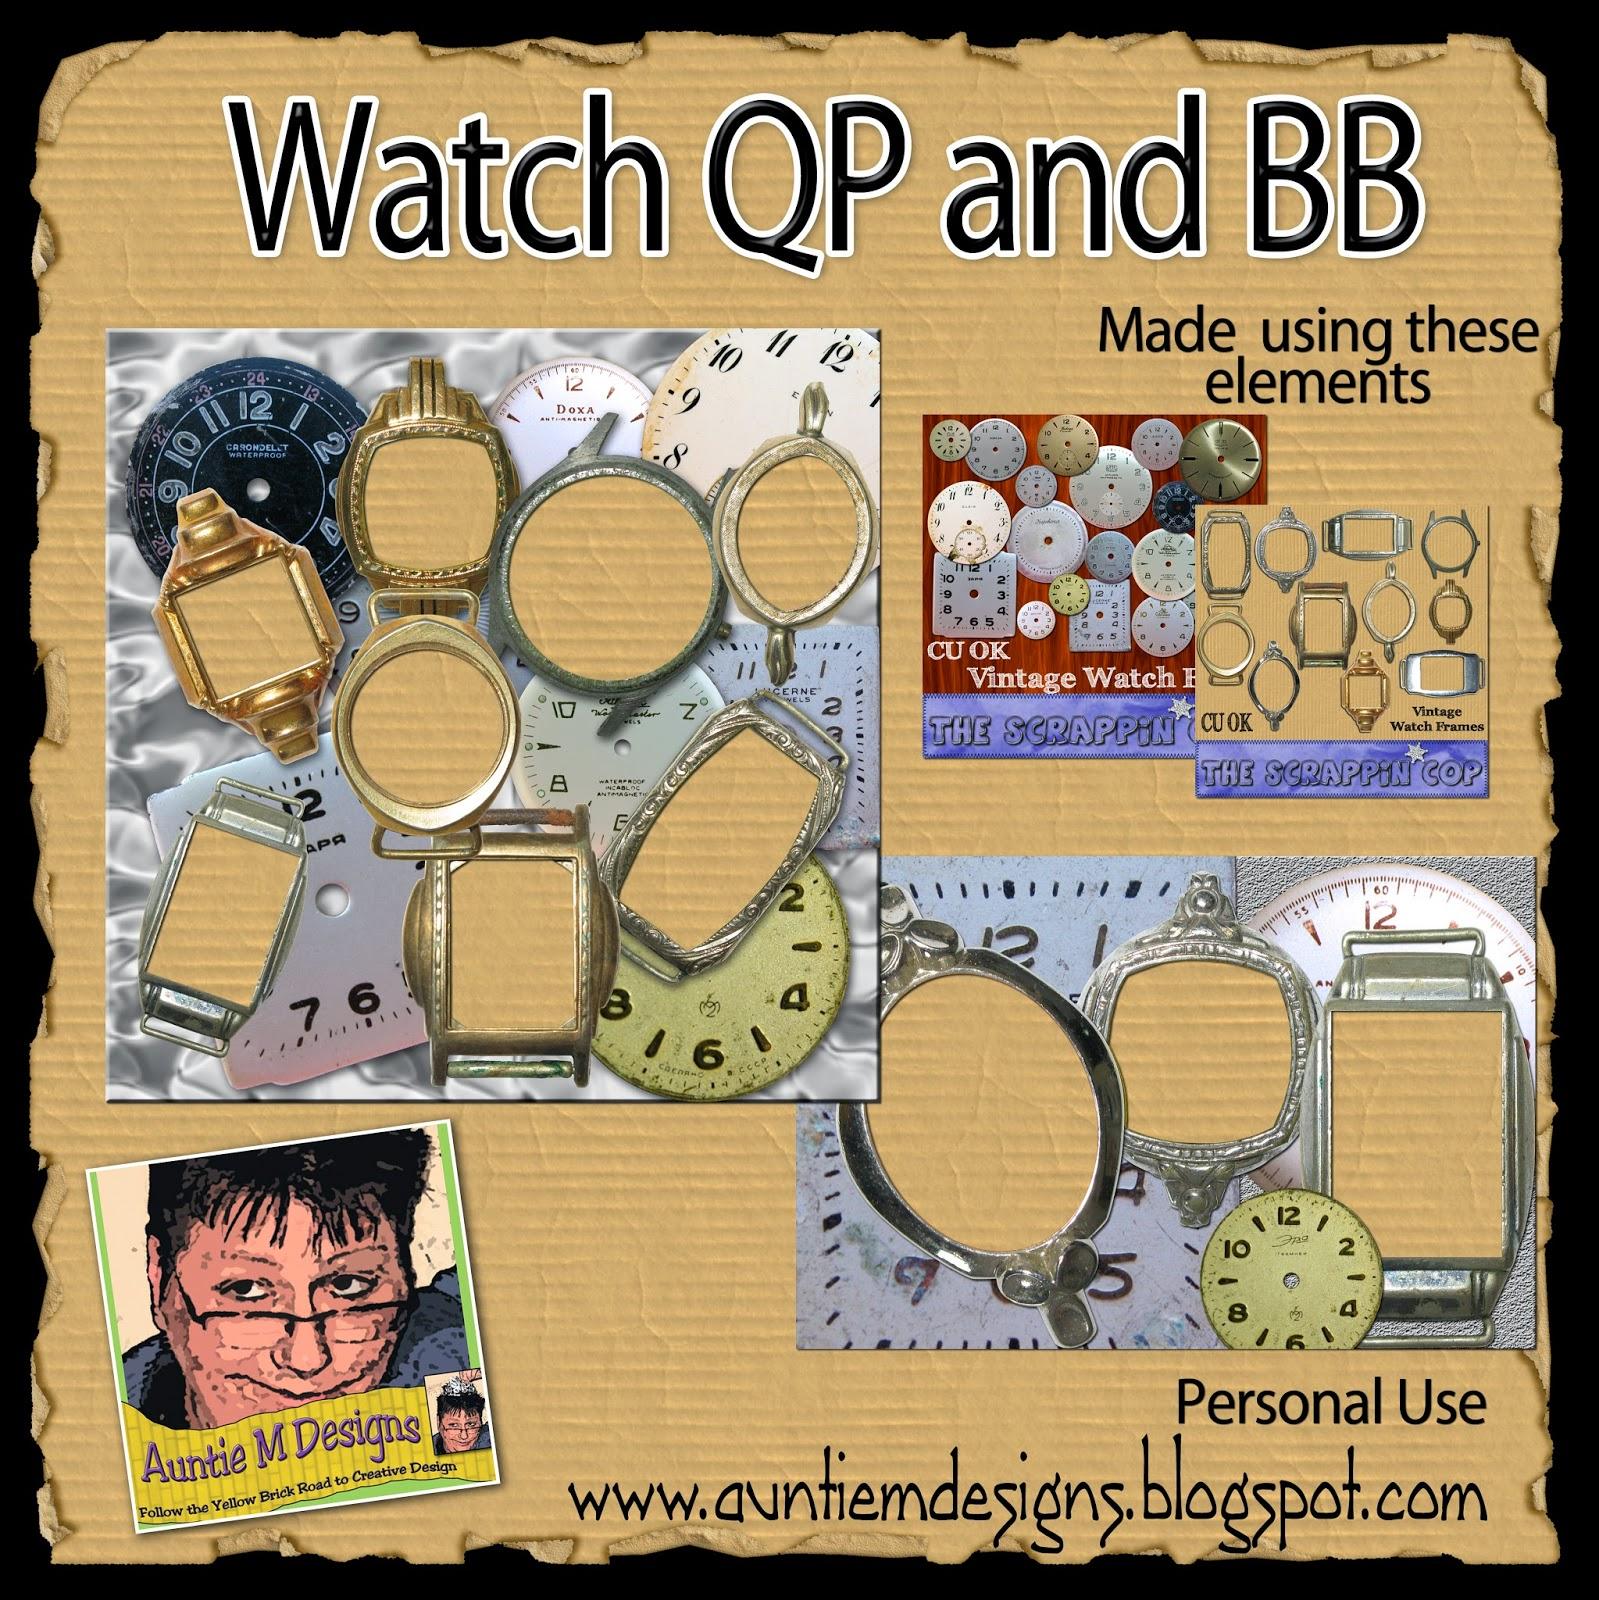 http://1.bp.blogspot.com/-TMwPvGrbAFA/U5d4CgEizhI/AAAAAAAAGxk/BwuR1PLt28Q/s1600/folder+600.jpg